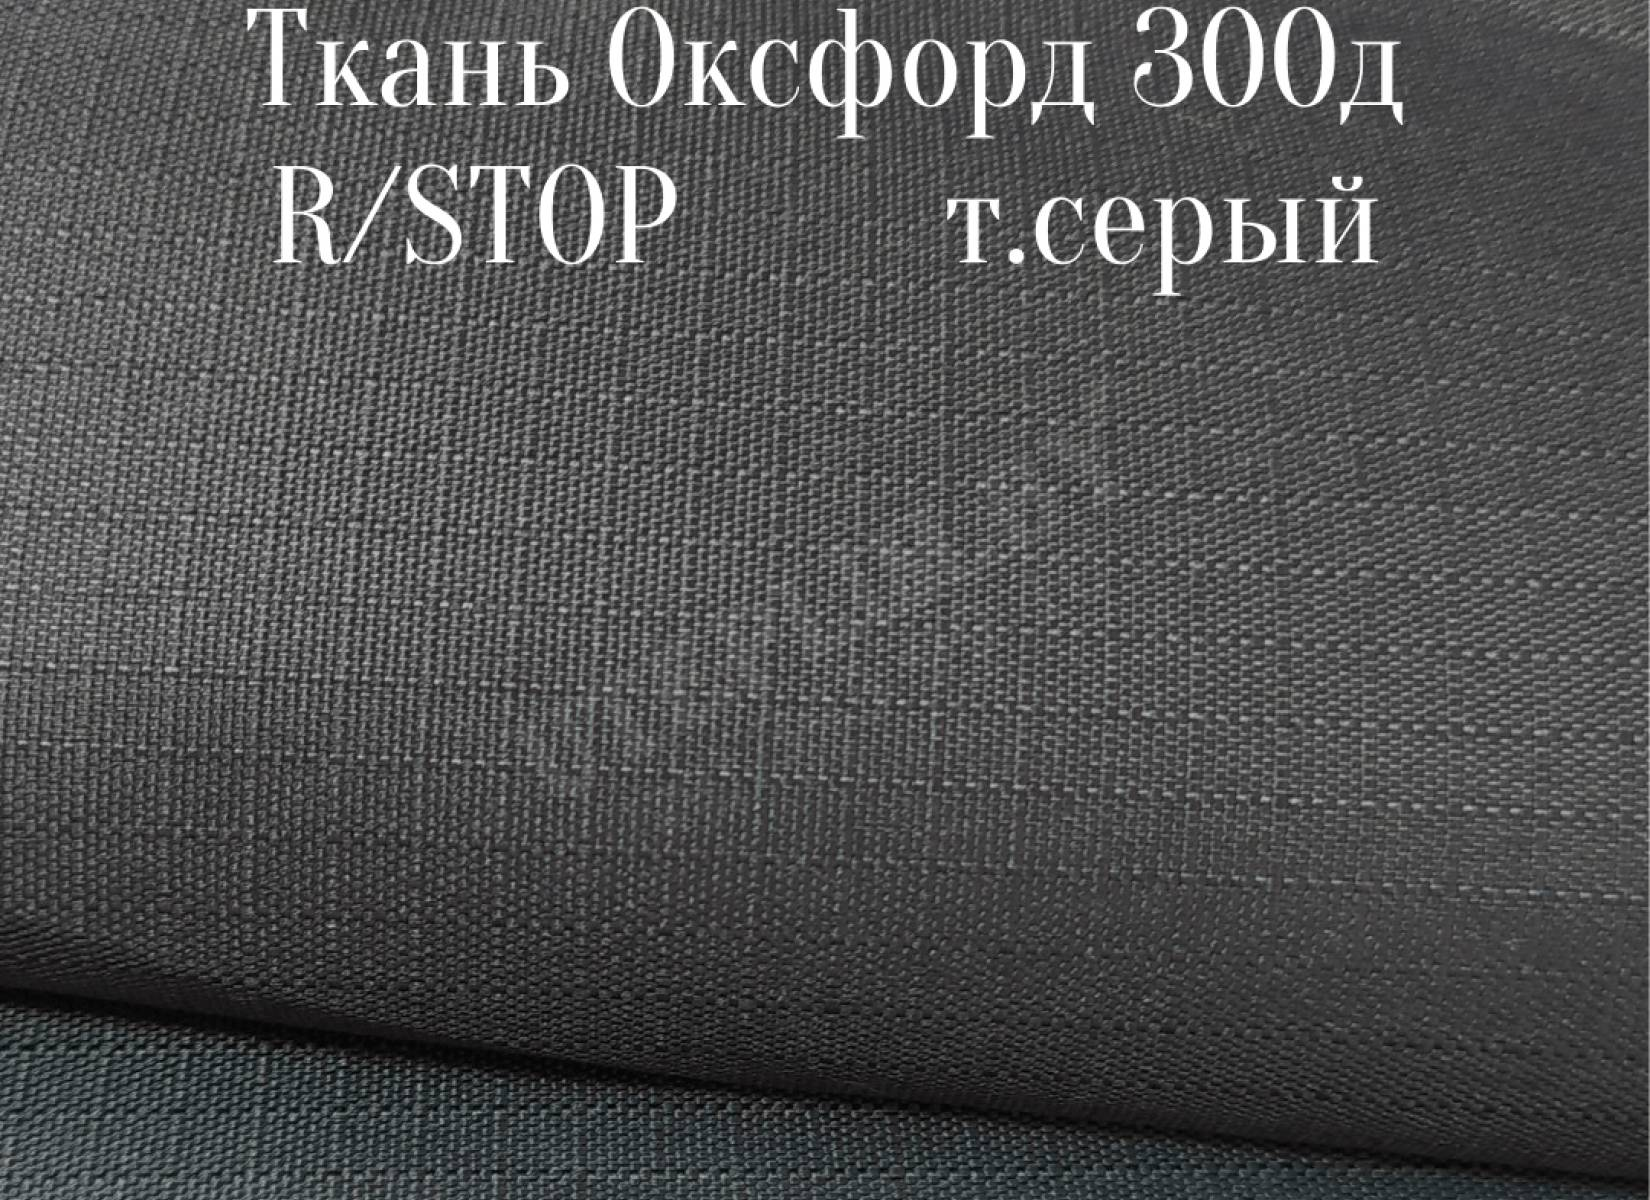 300д рип-стоп - т.серый